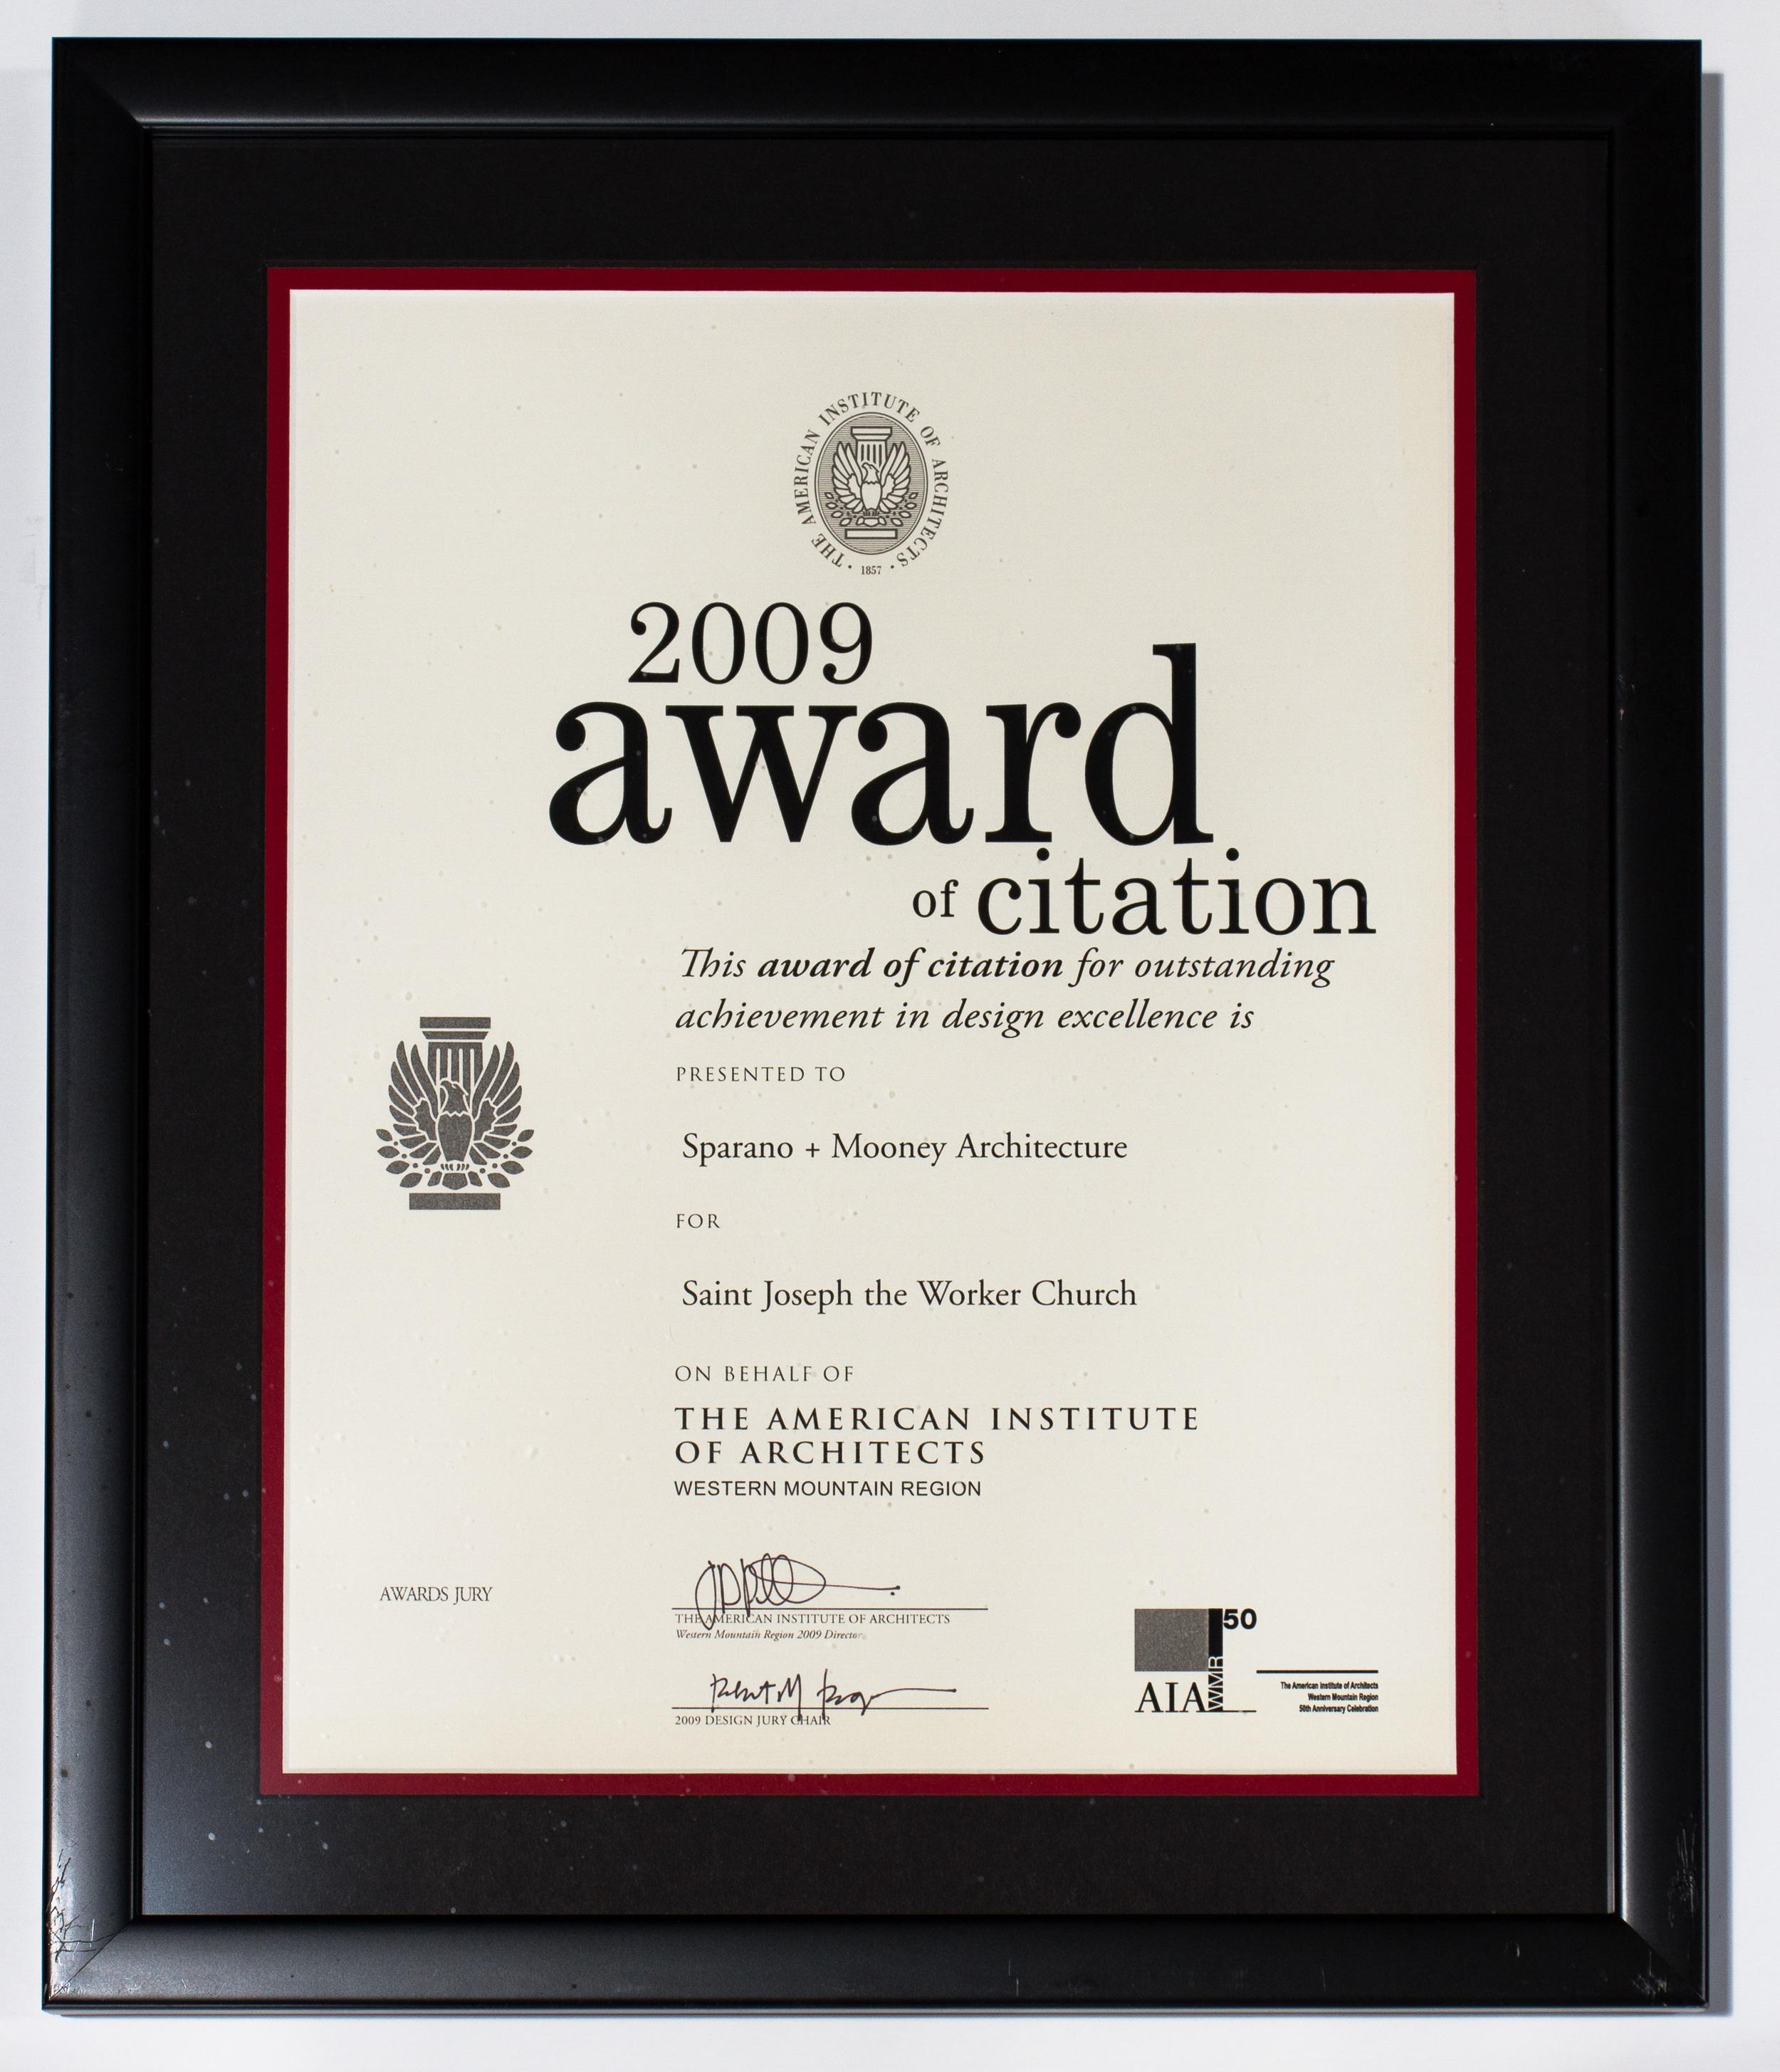 SparanoMooneyArchitecture_Award(13)